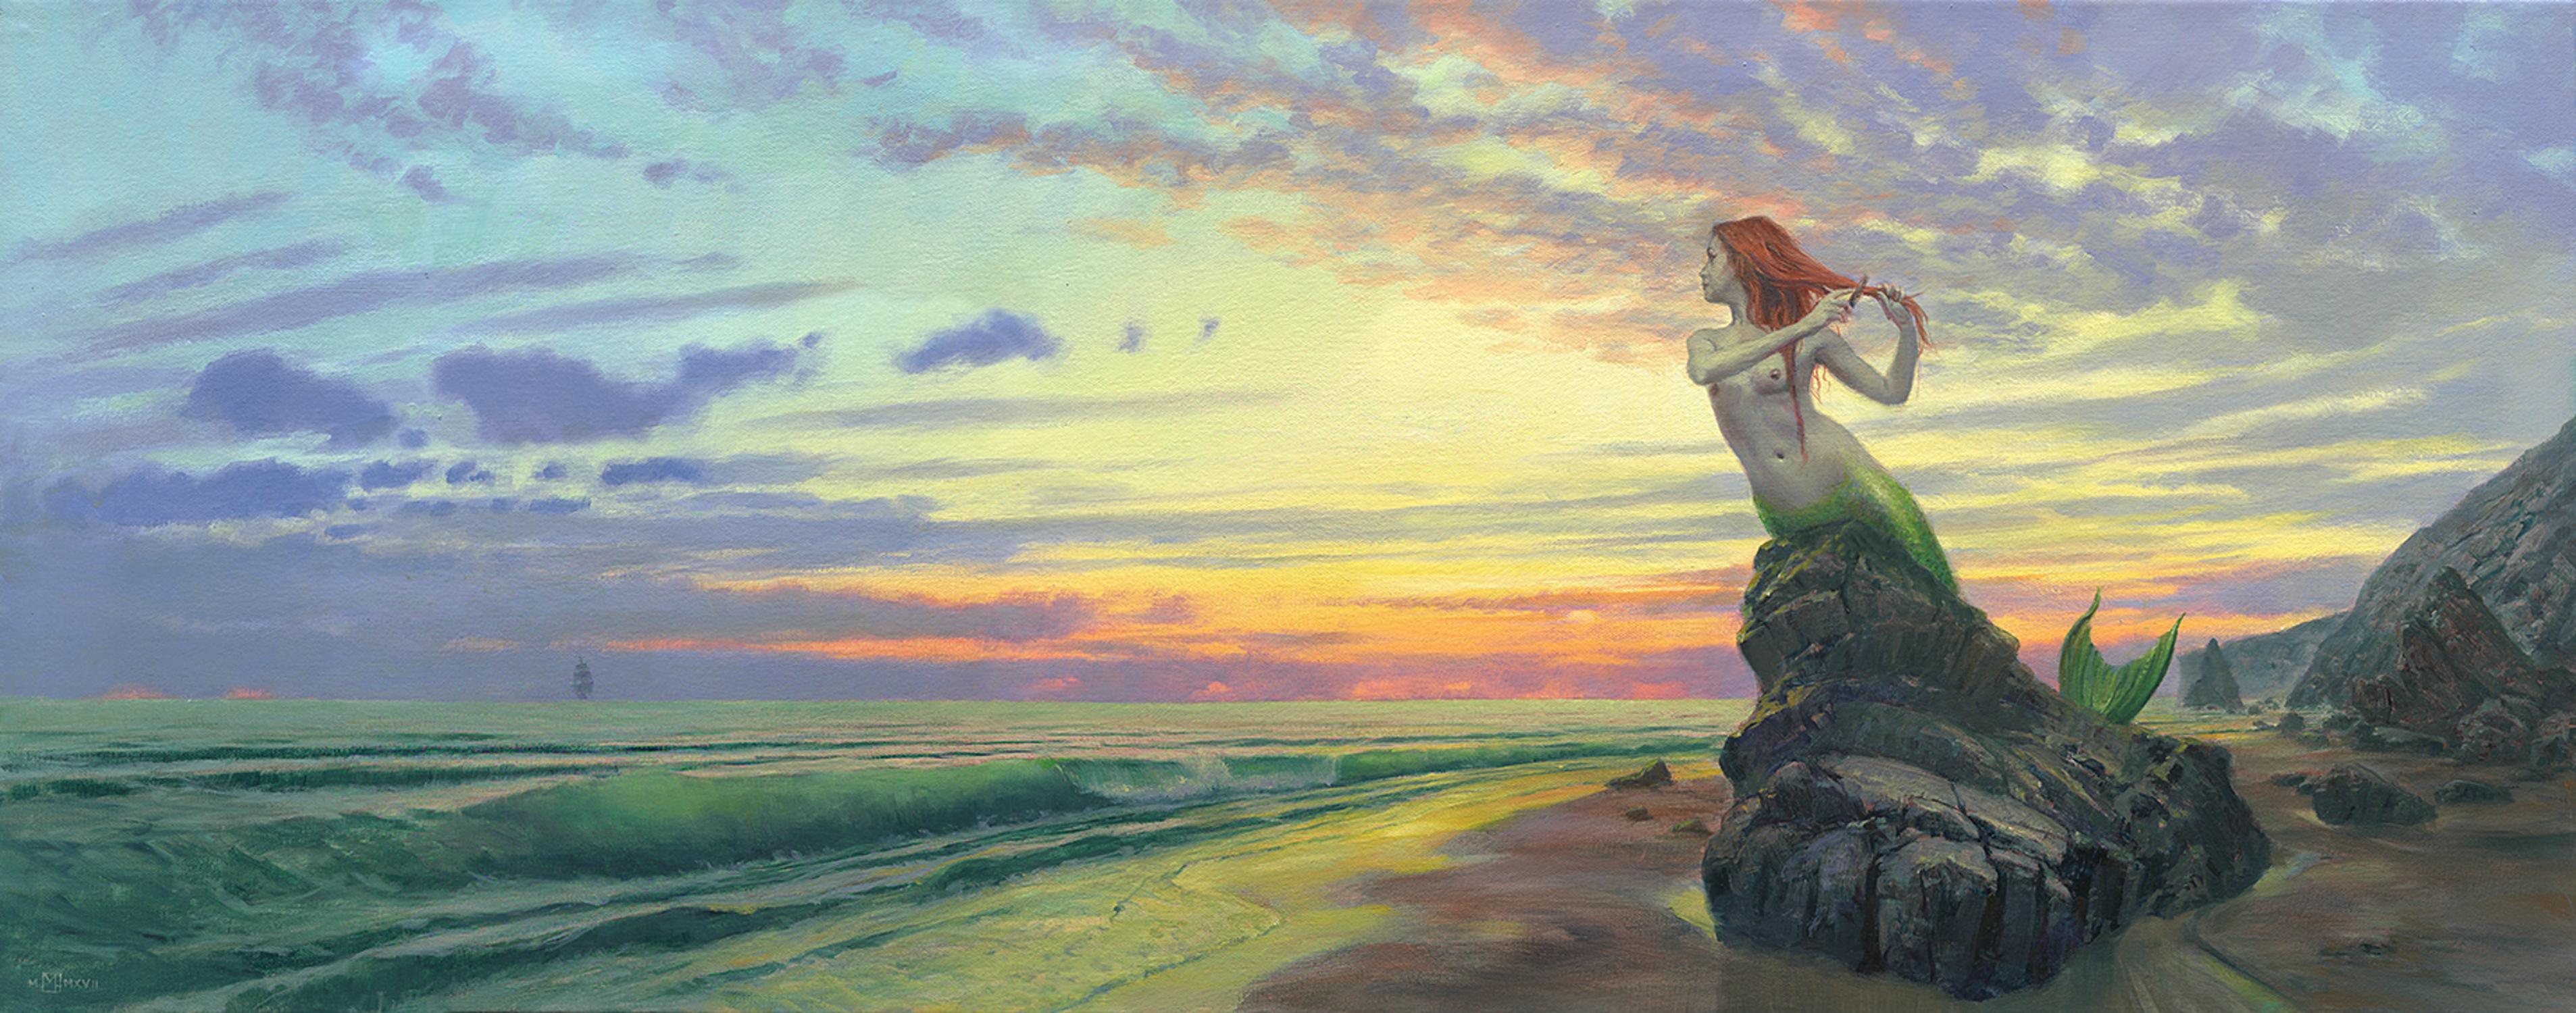 Siren's Dawn Artwork by Mark Harrison